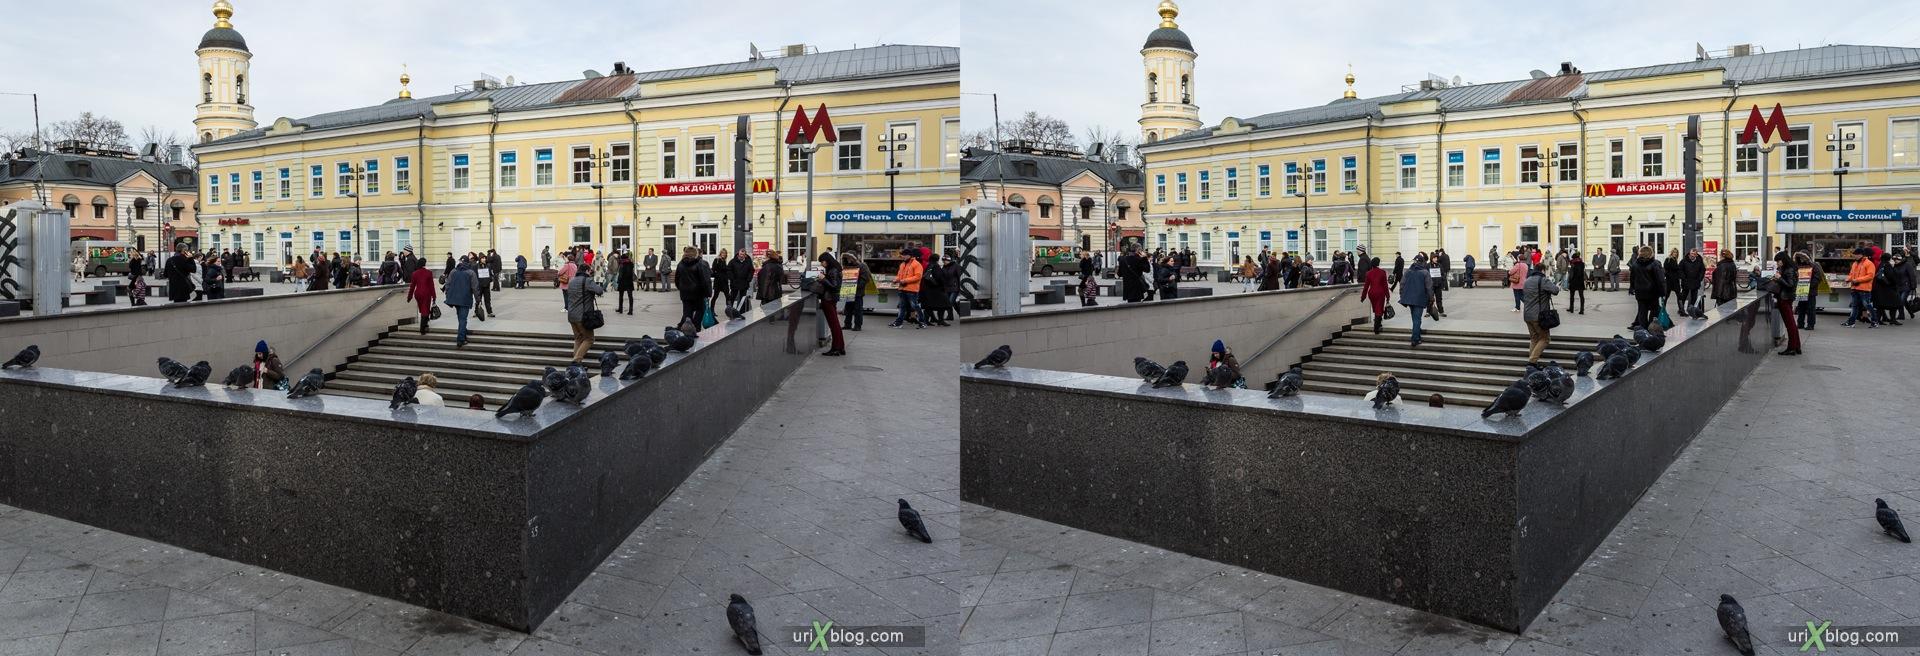 2013, Moscow, Russia, Tratjakovskaya, metro, square, street, new pedestrian zone, 3D, stereo pair, cross-eyed, crossview, cross view stereo pair, stereoscopic